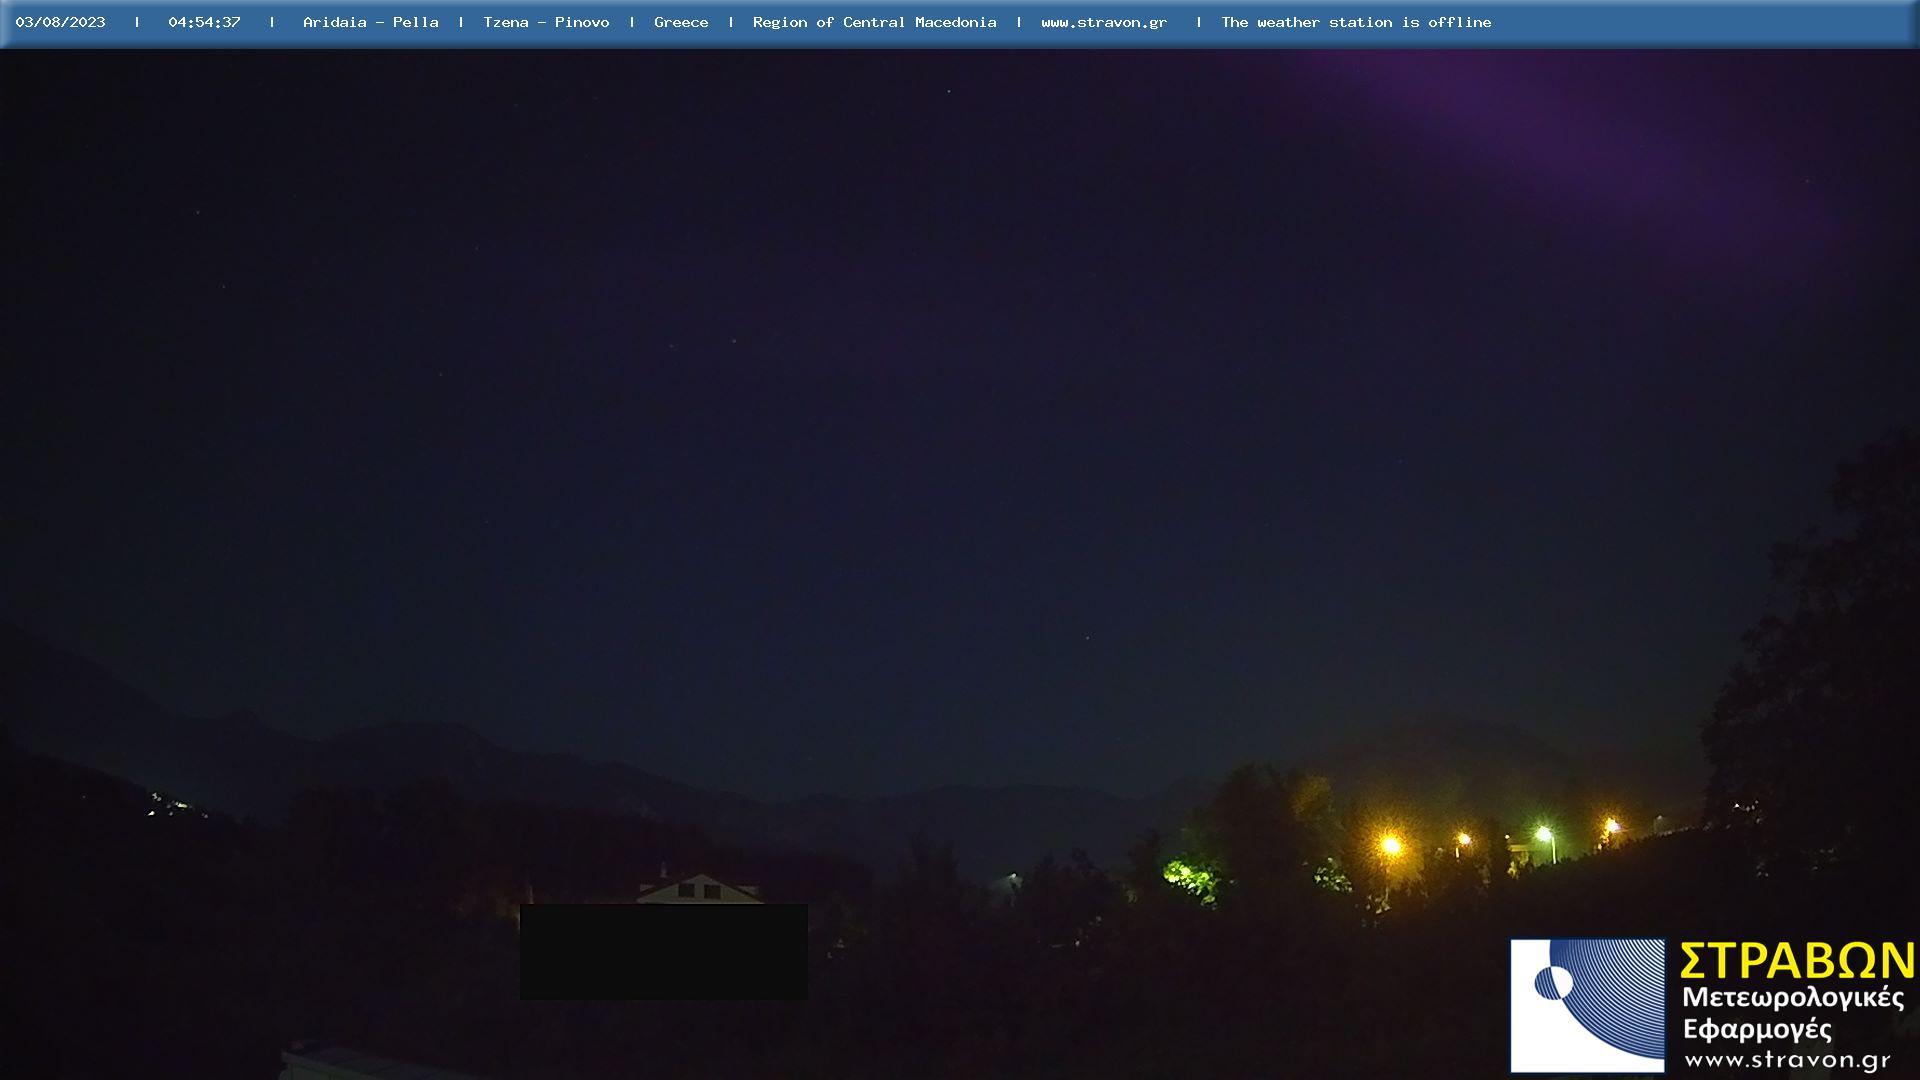 http://www.stravon.gr/meteocams/aridaia/